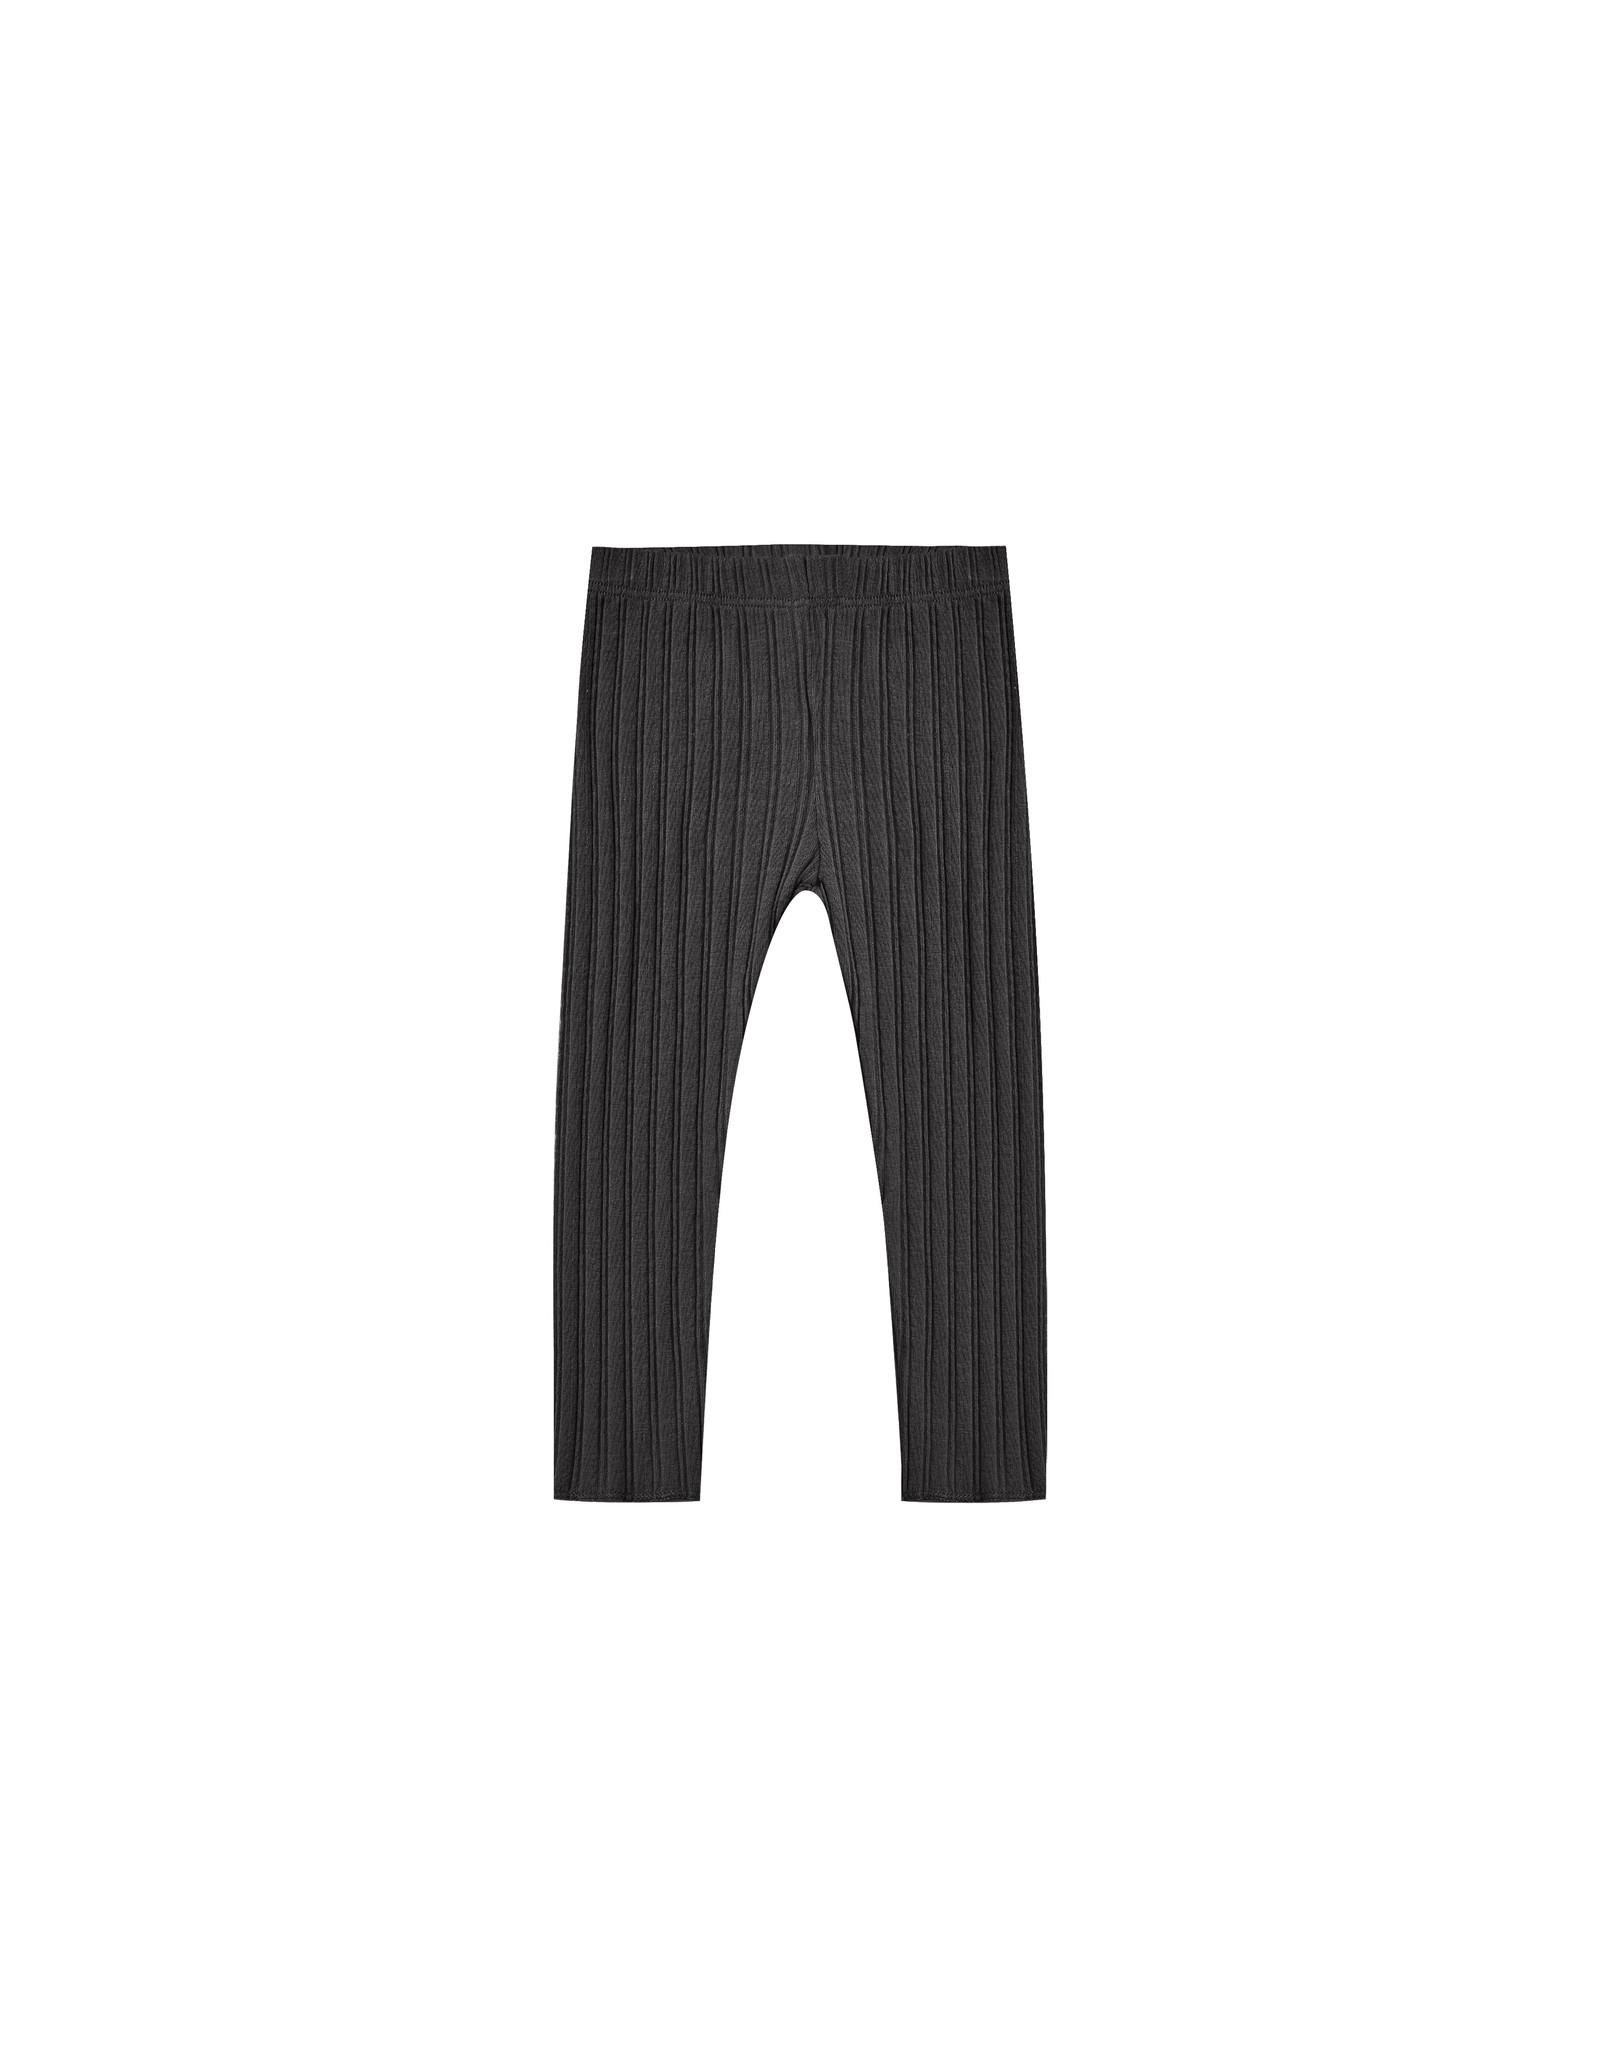 Rylee + Cru Rib Knit Legging